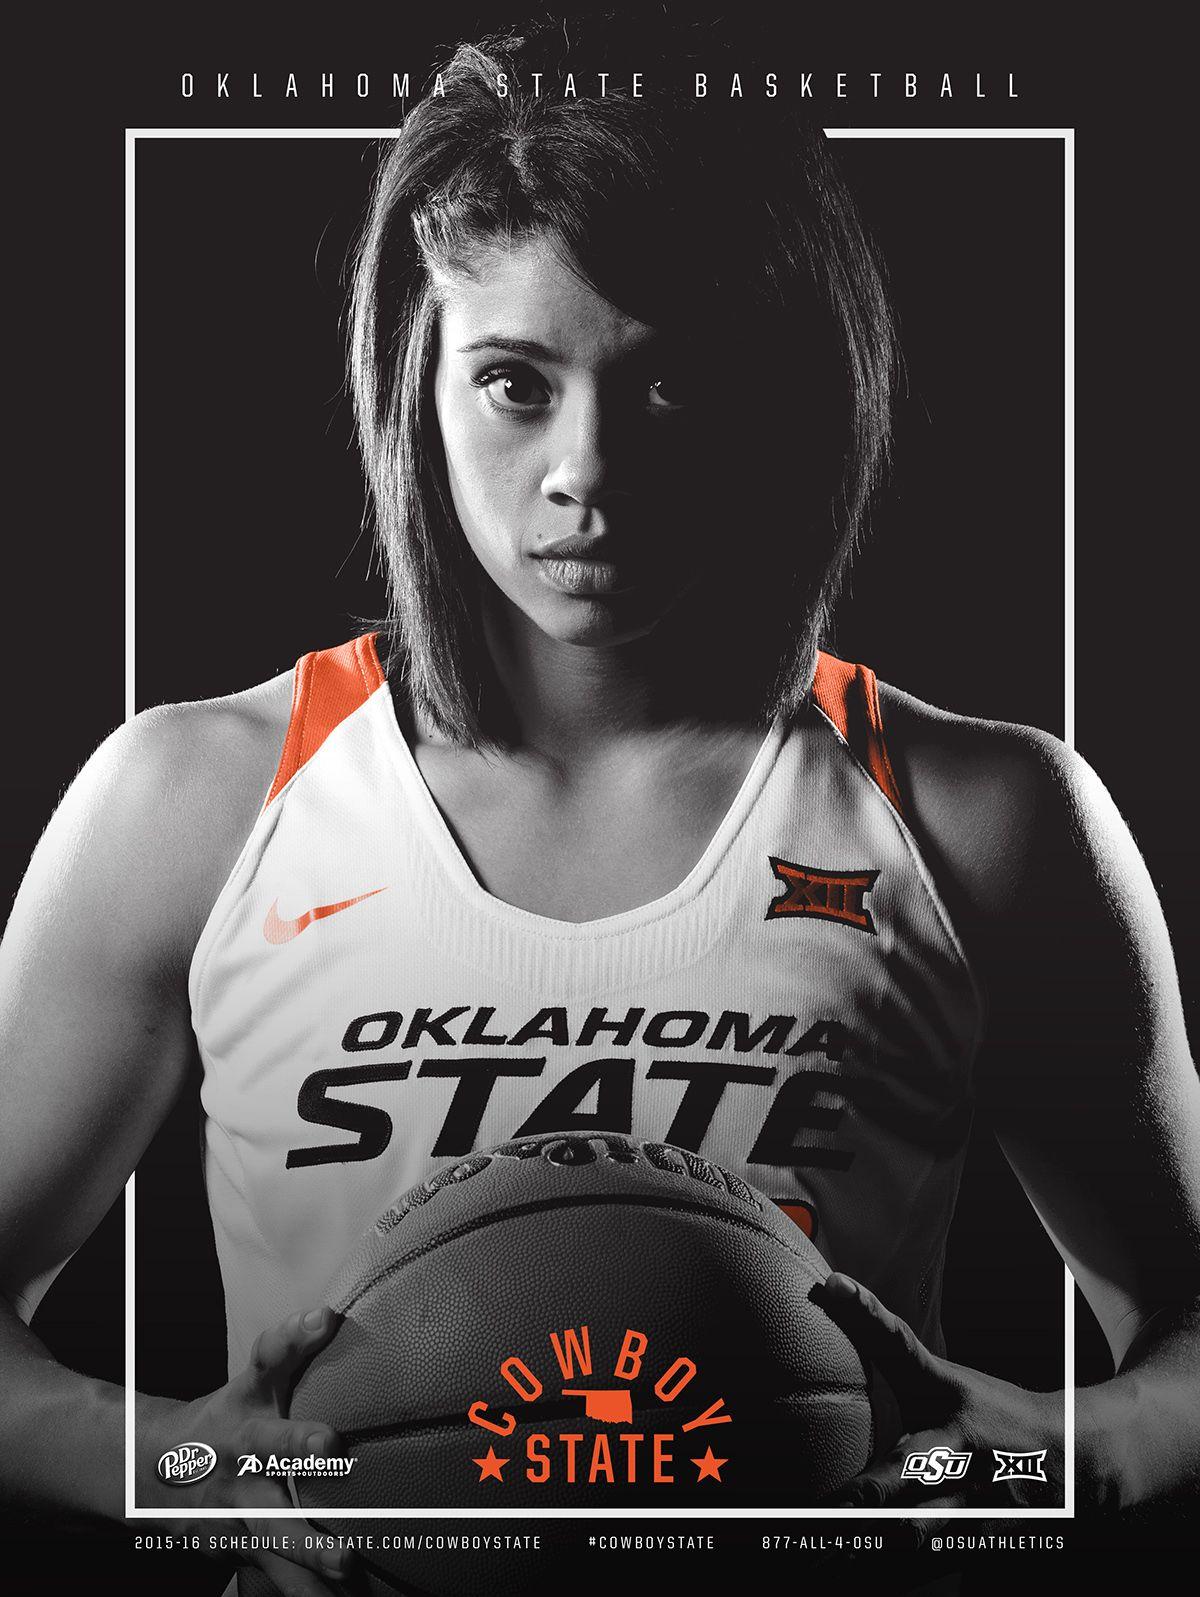 201516 Oklahoma State Women's Basketball Poster on